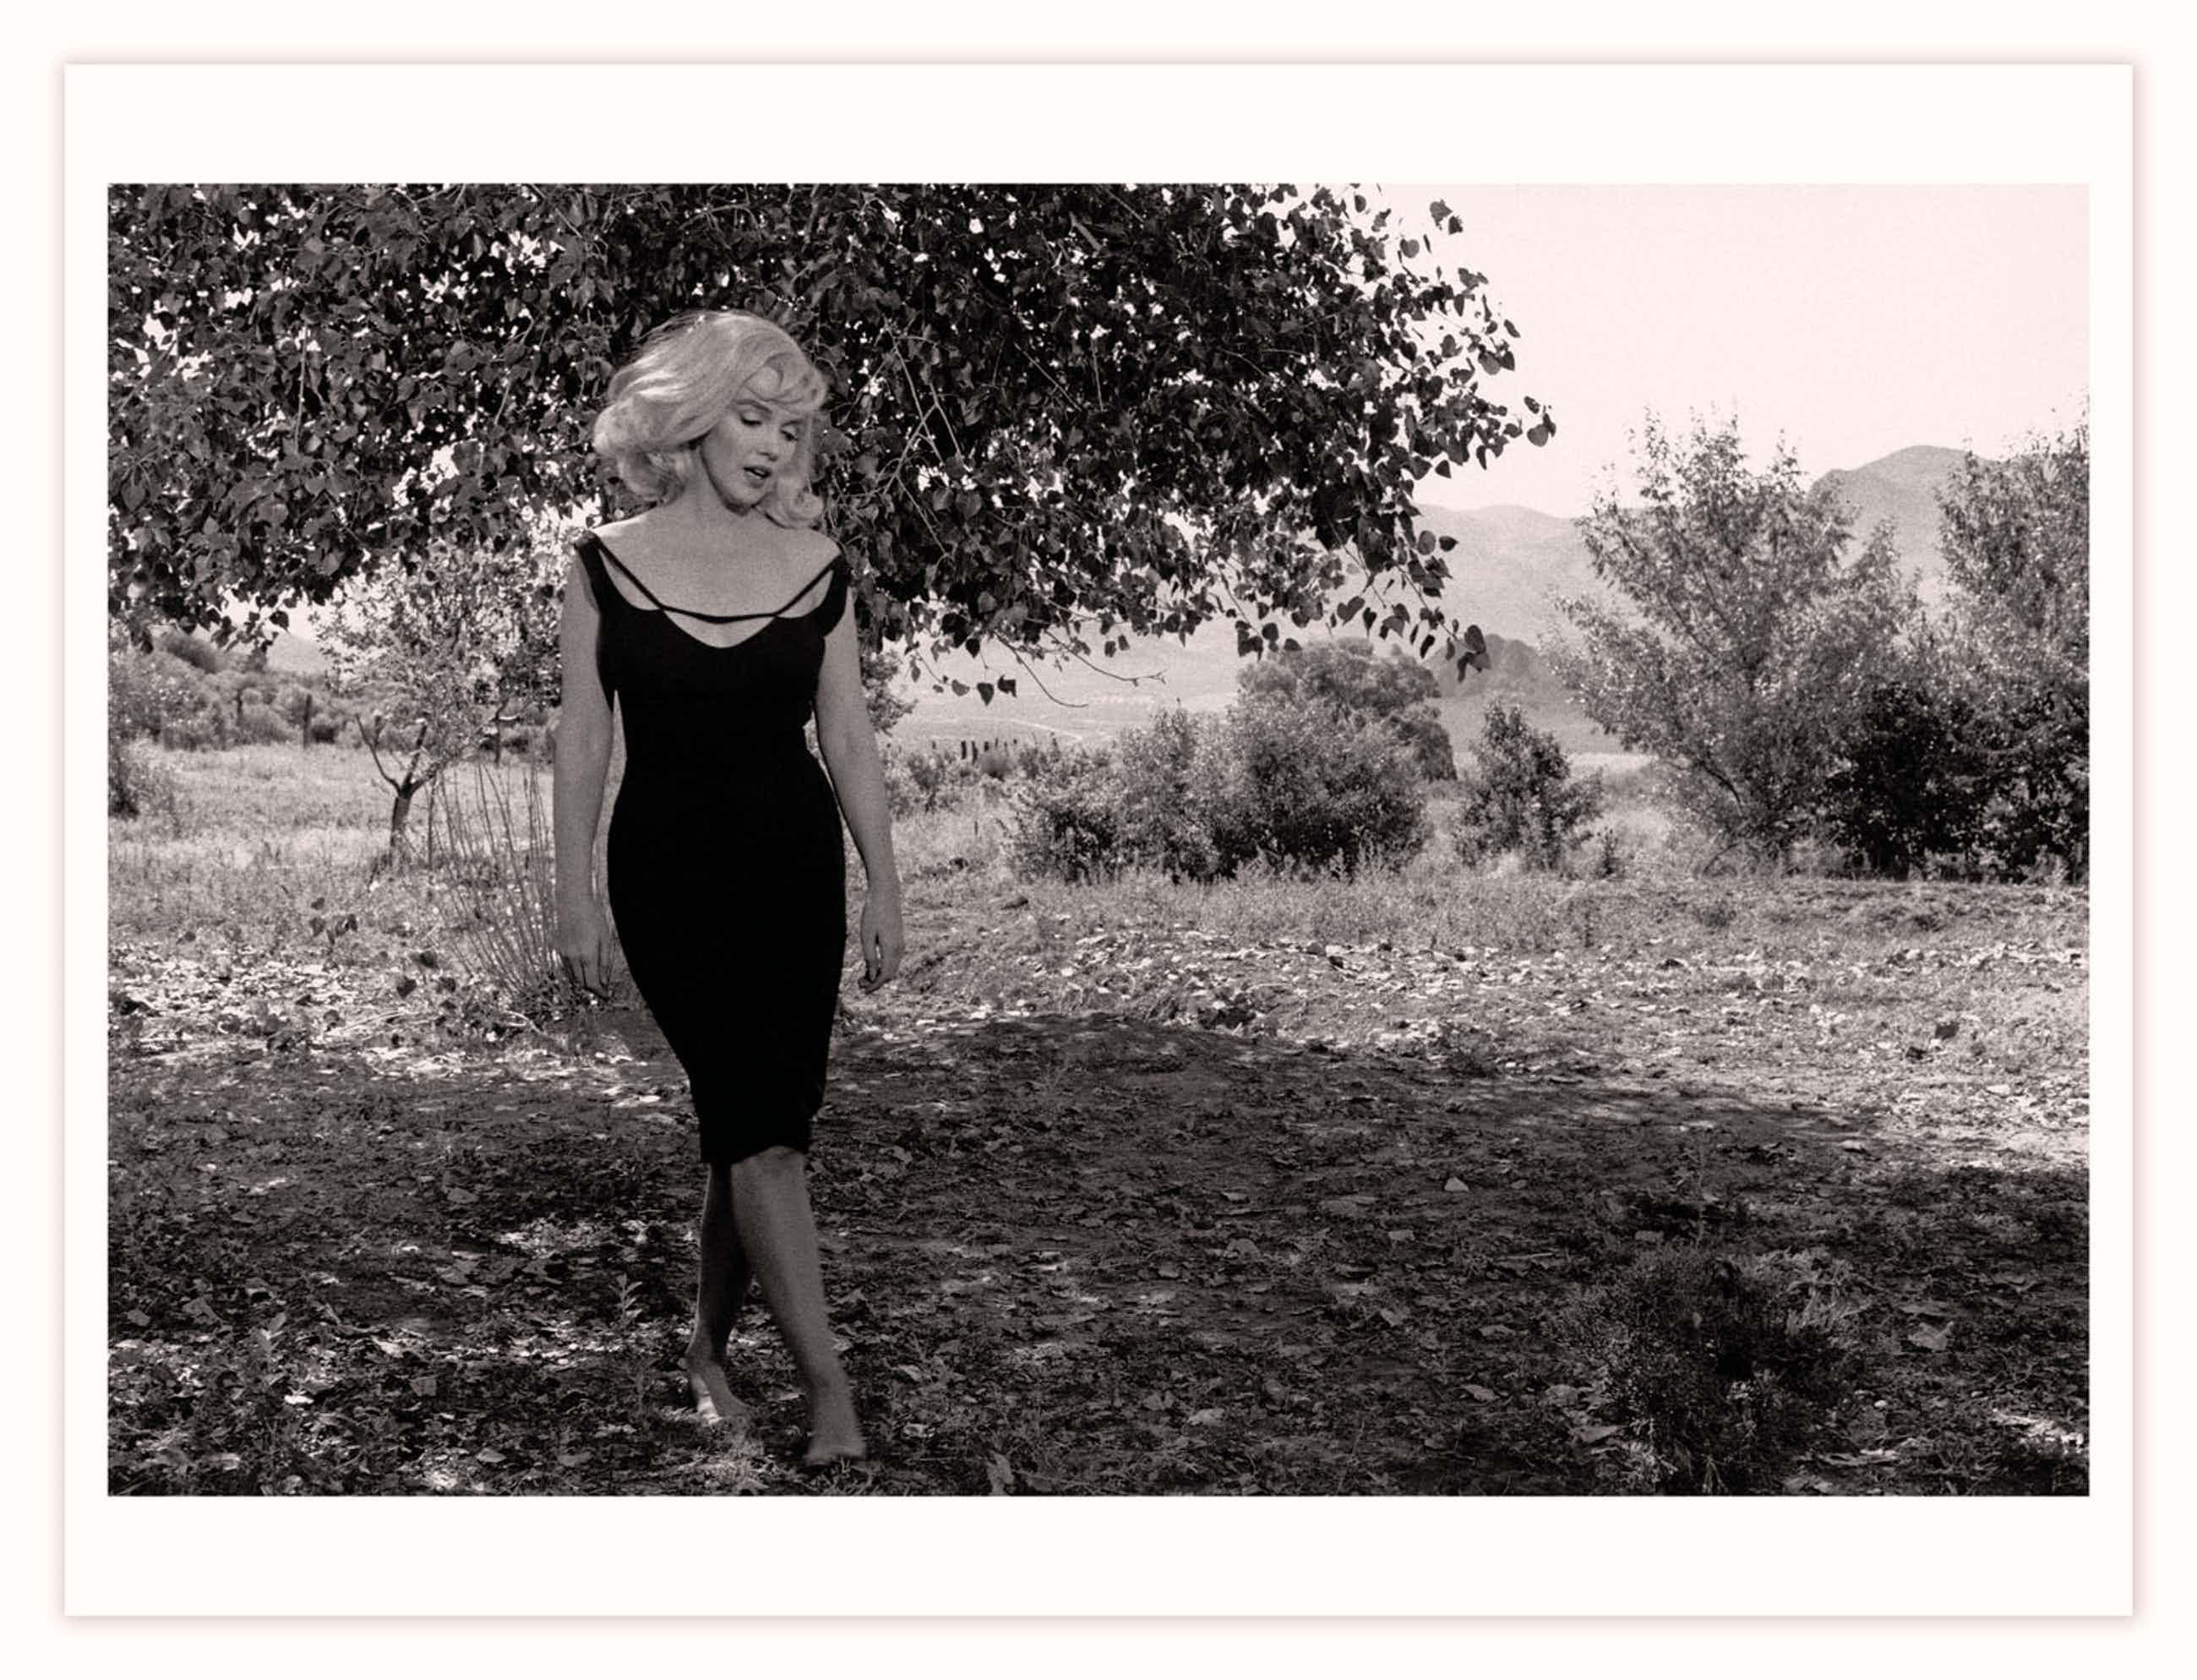 Inge Morath - Marilyn Monroe - 1960 - Magnum Limited Edition - 200 ex. - Groot kopen? Bied vanaf 400!